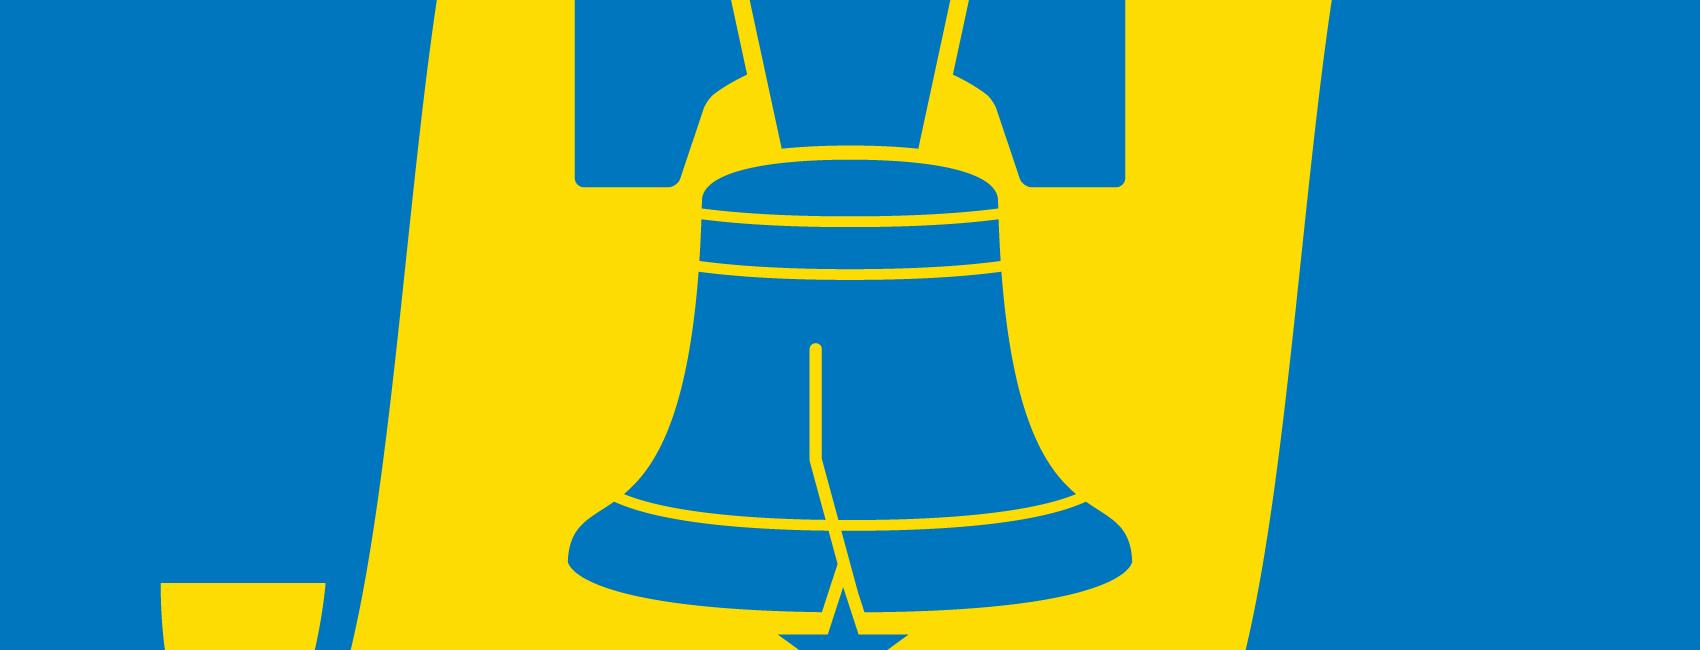 20130930-DesignPhila-Flag-32x21-REVF